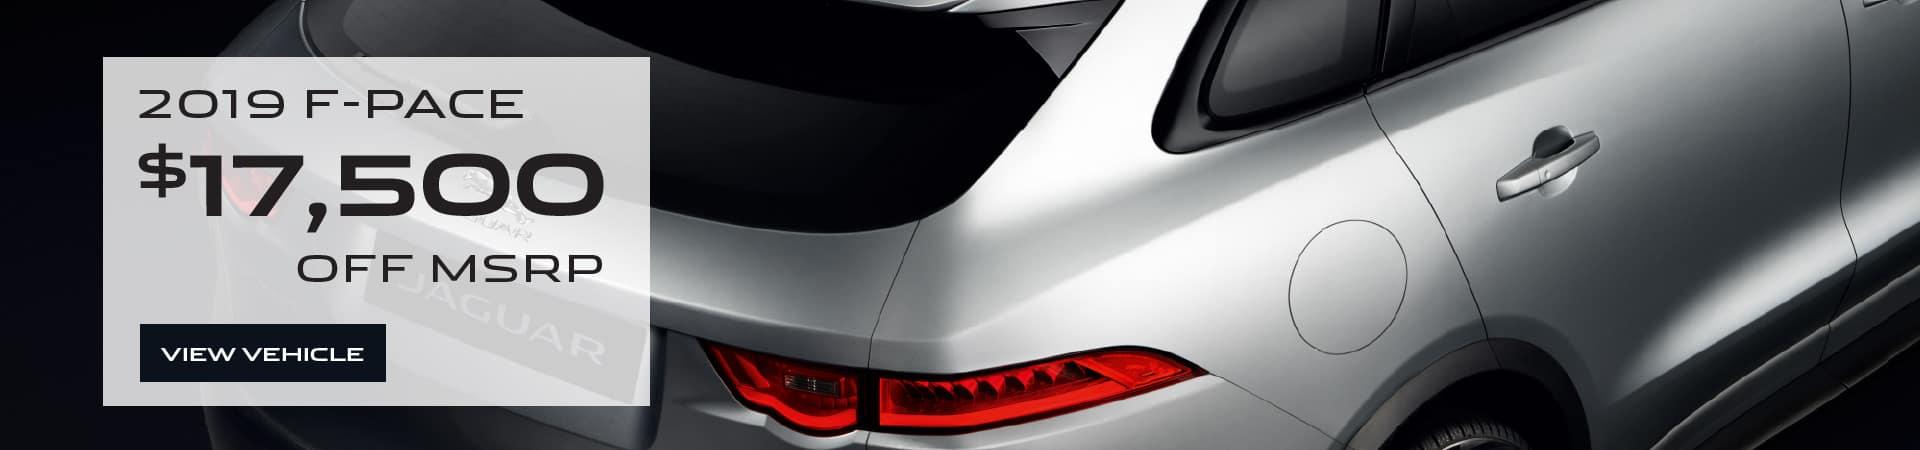 Autobahn Jaguar Fort Worth - F-PACE $17,500 off MSRP